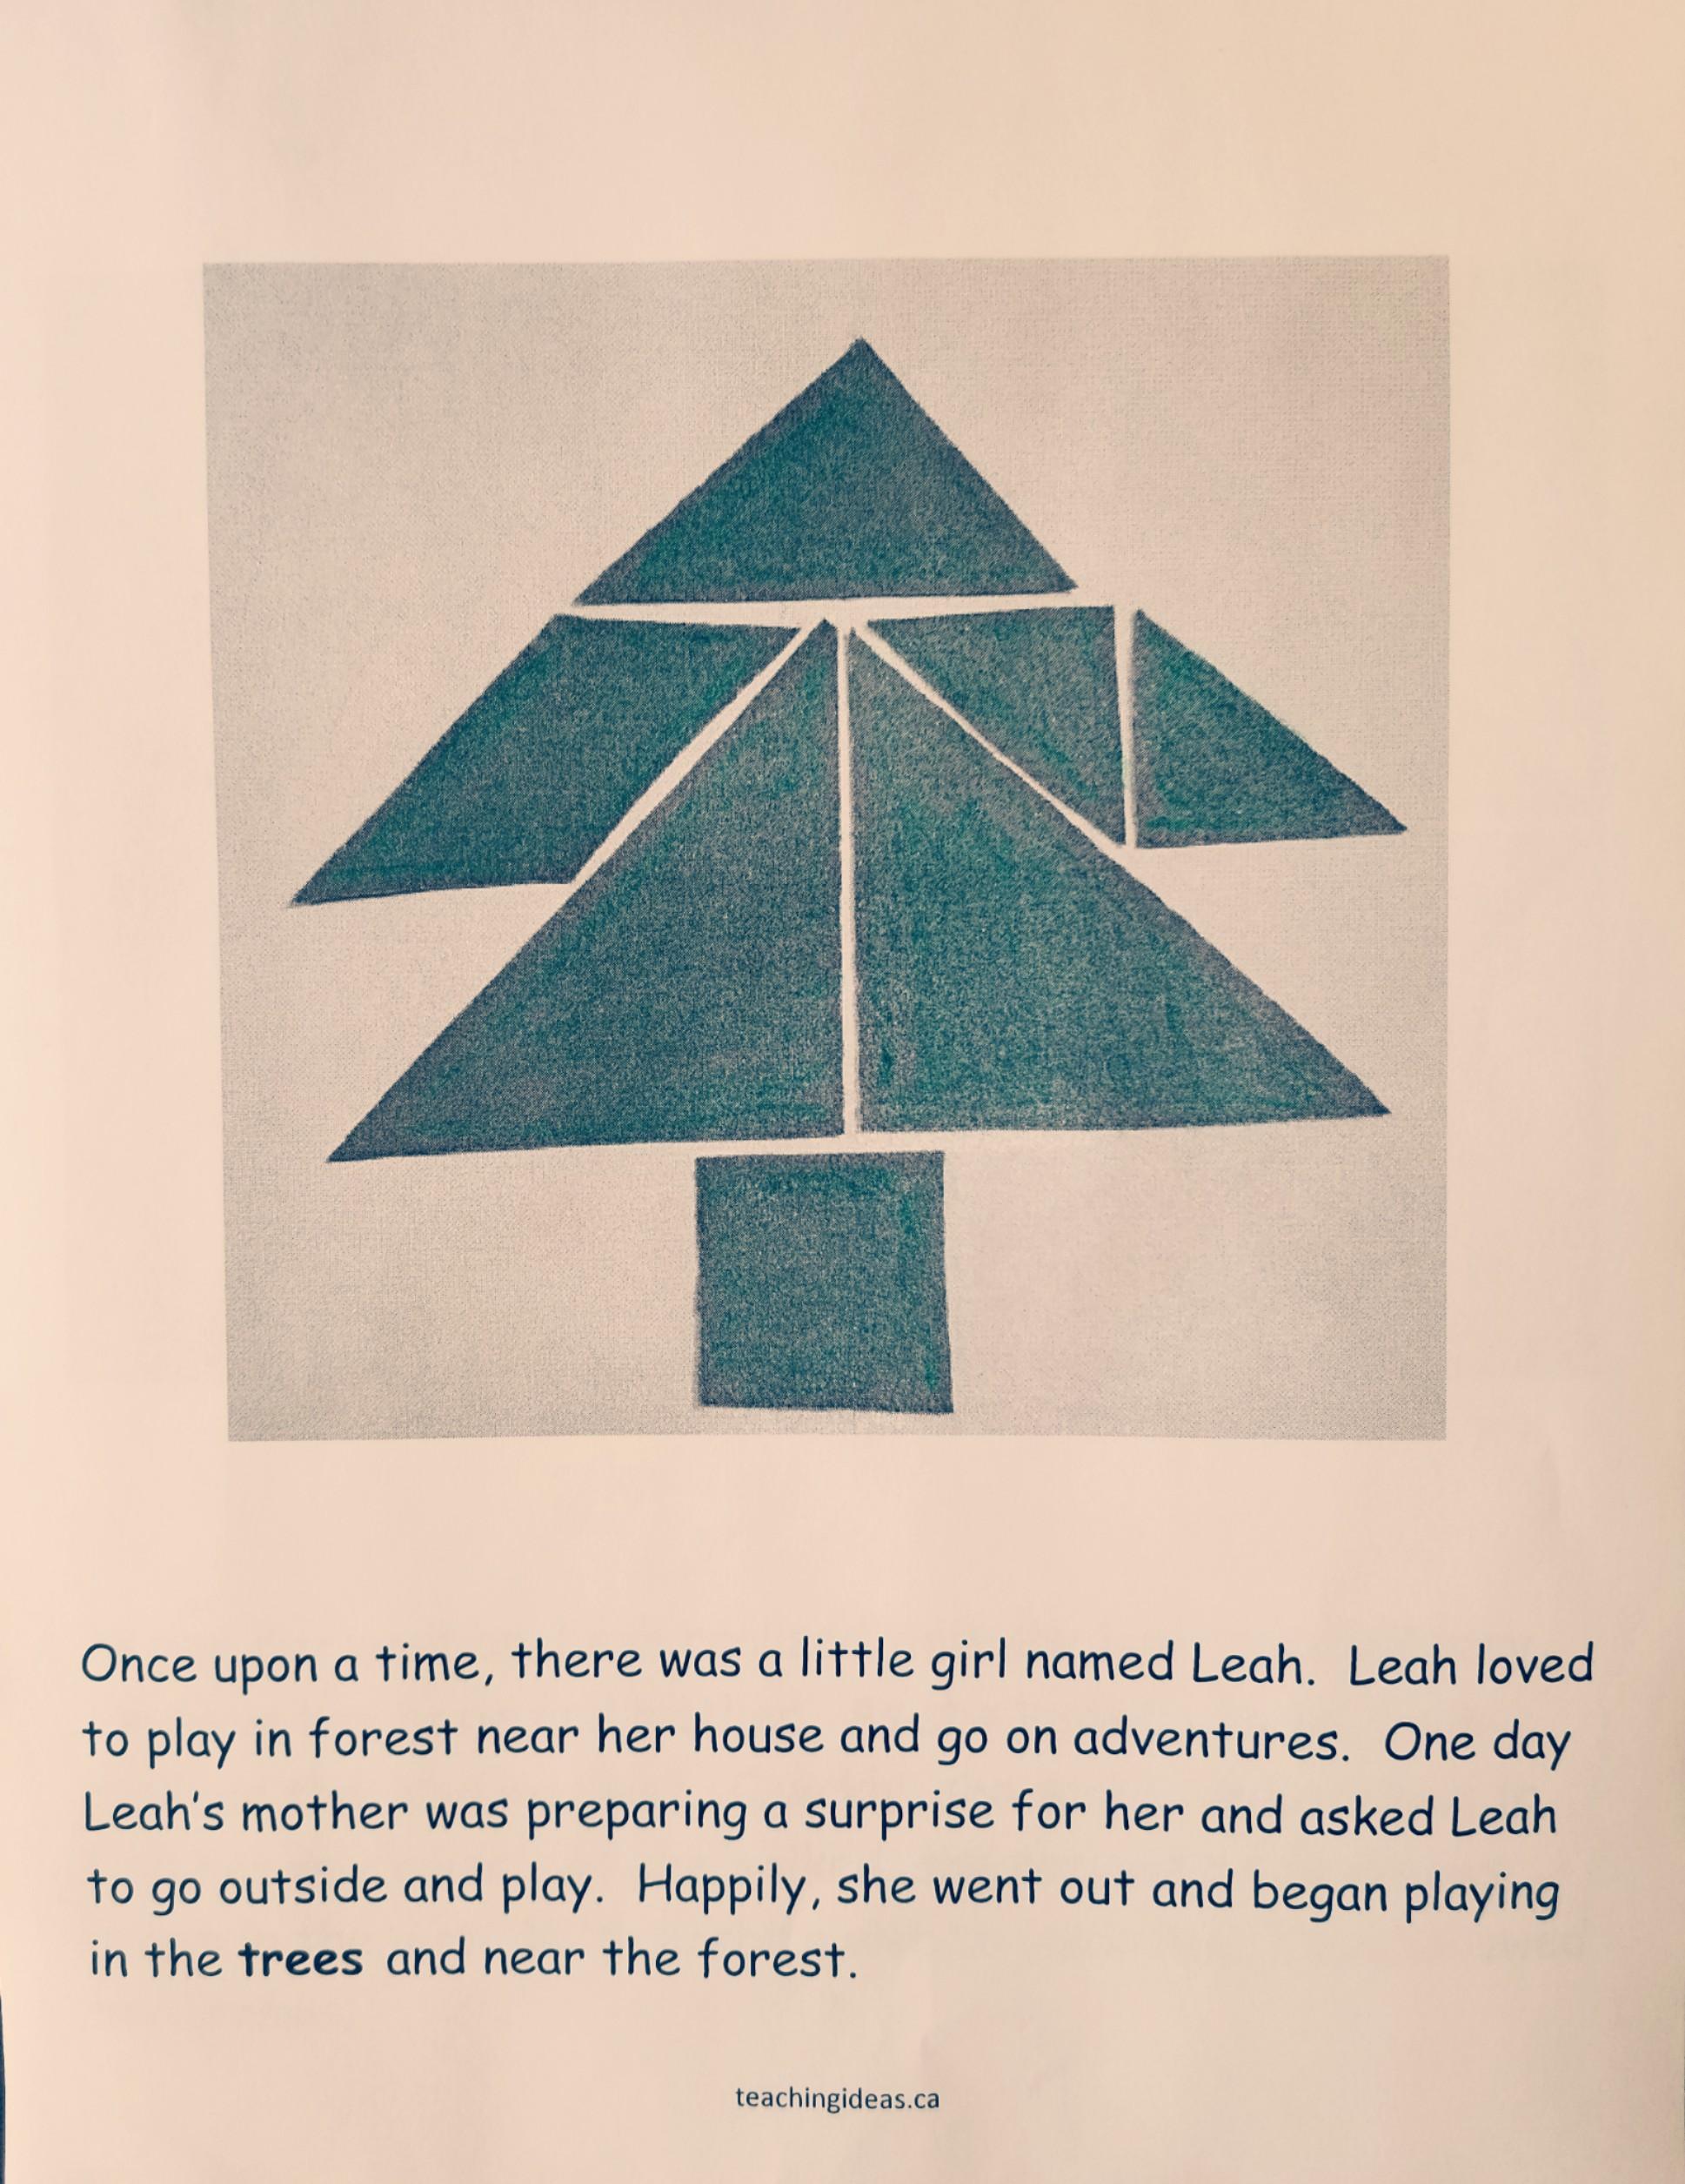 tangram math activity for kids  handson teaching ideas